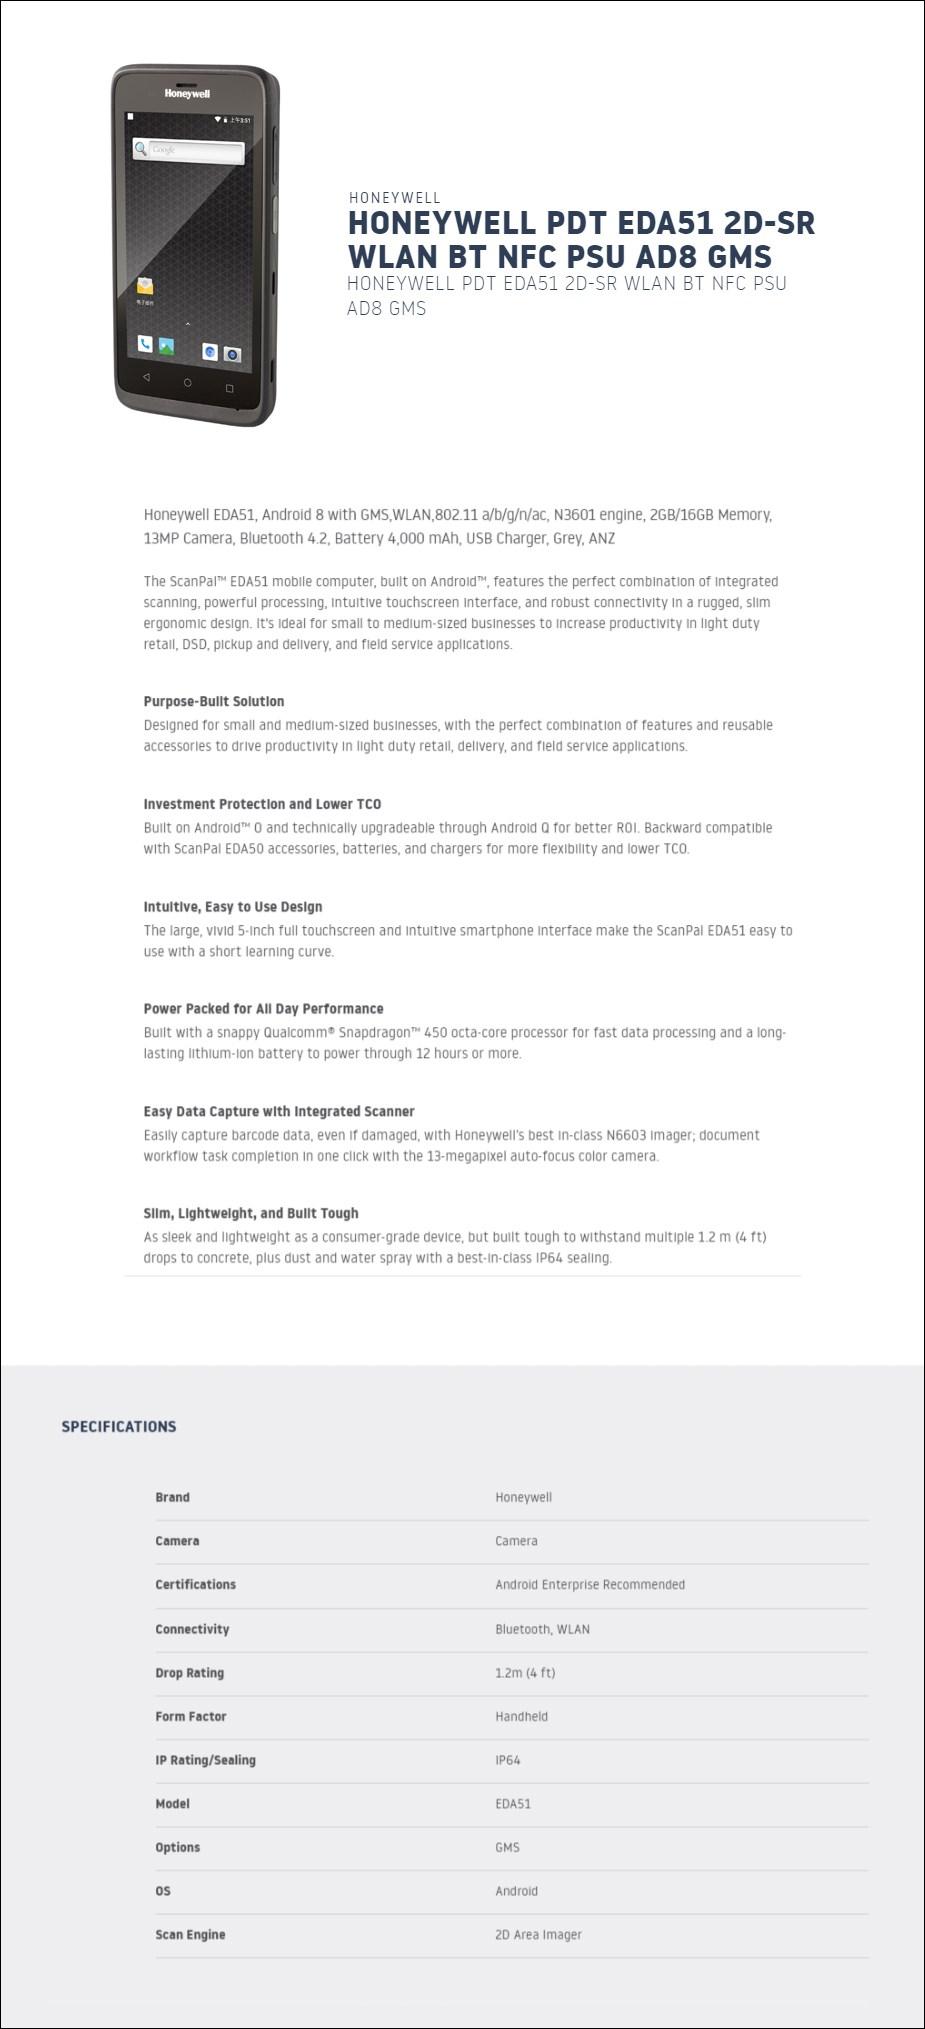 Honeywell EDA51 2GB Ram 16GB Storage WLAN Android 8 PDA - Overview 1